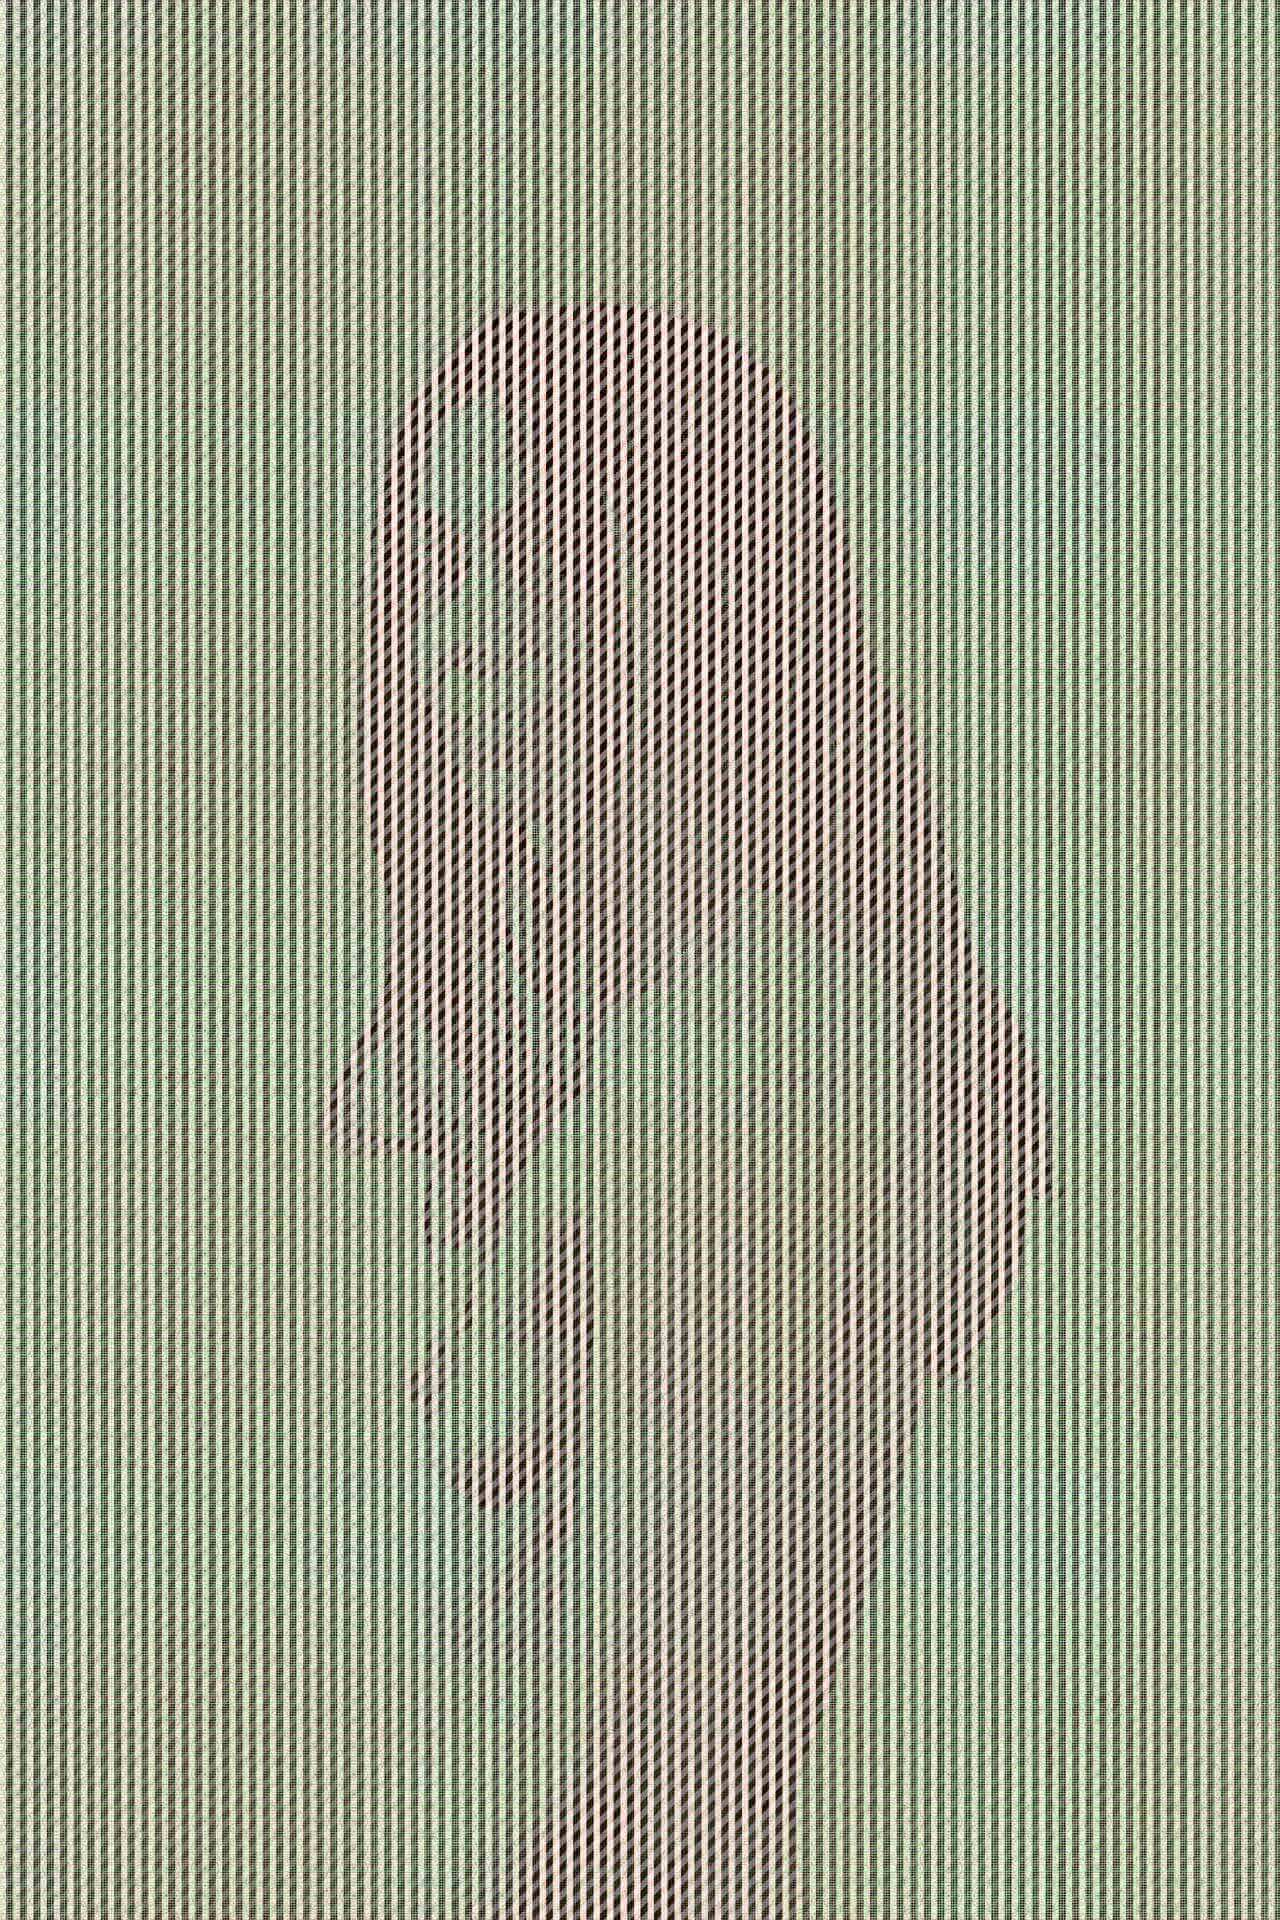 Untitled, 2016.